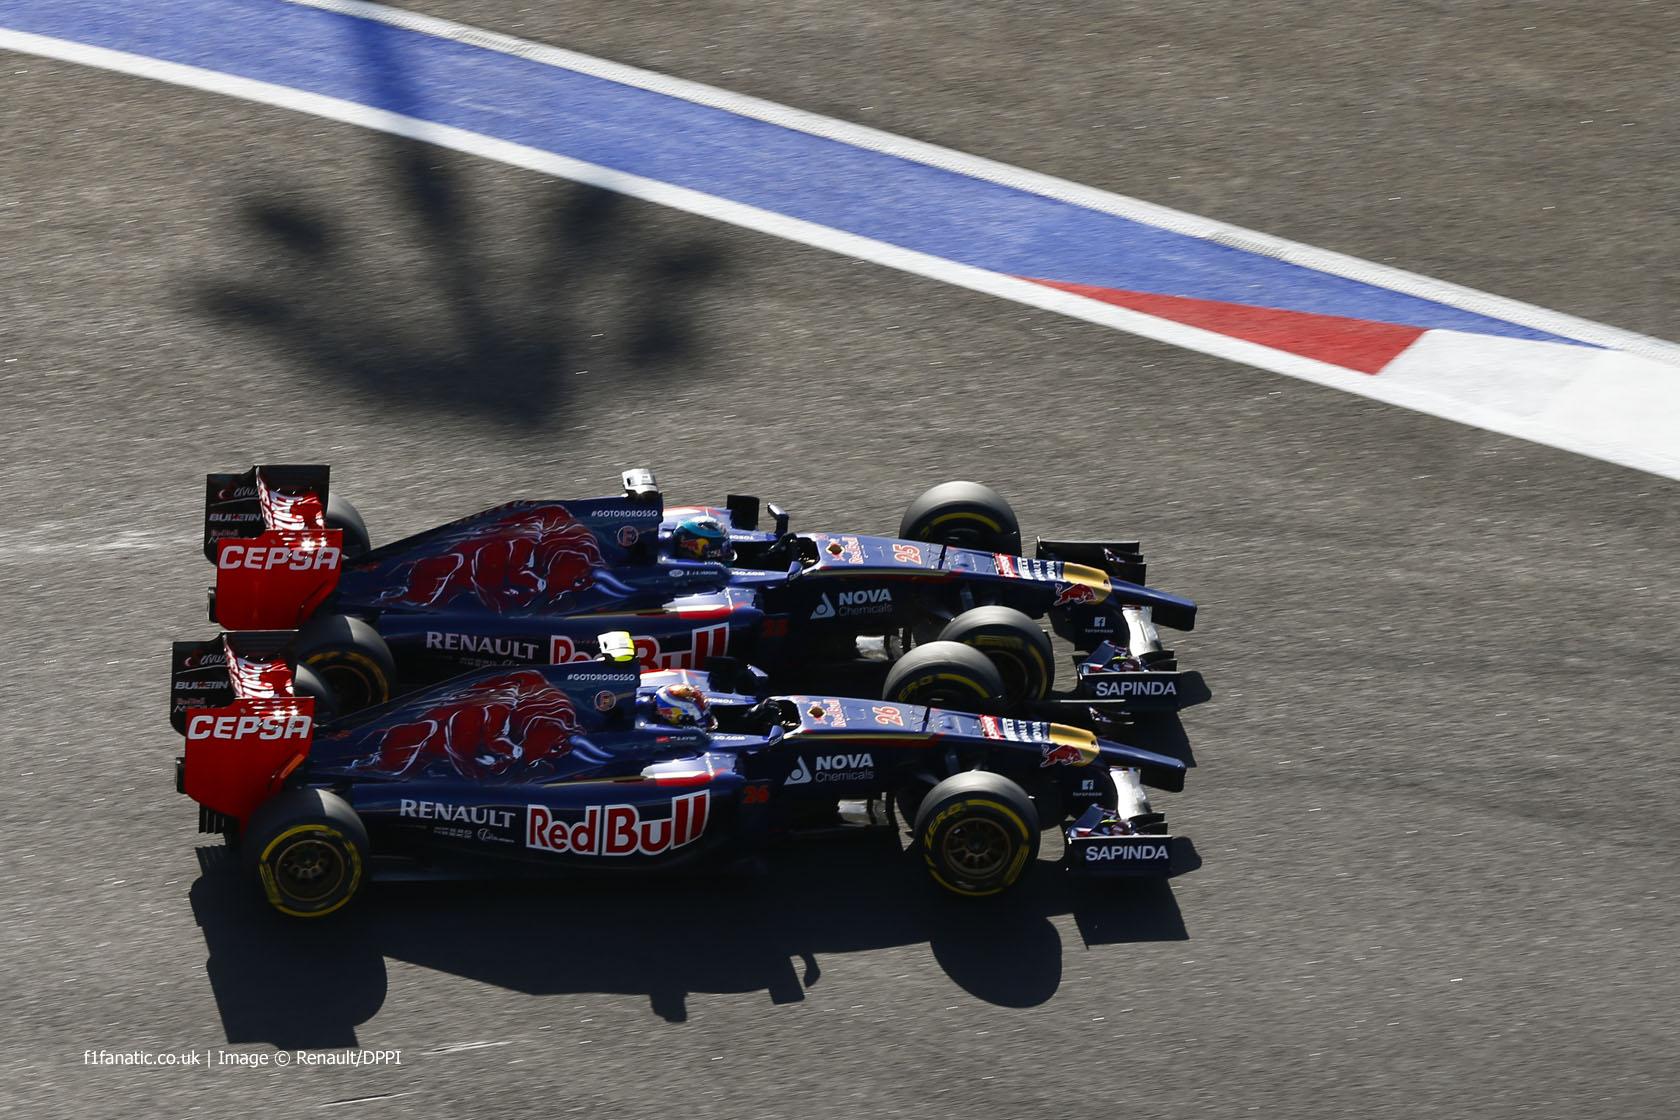 Daniil Kvyat, Jean-Eric Vergne, Toro Rosso, Sochi Autodrom, 2014